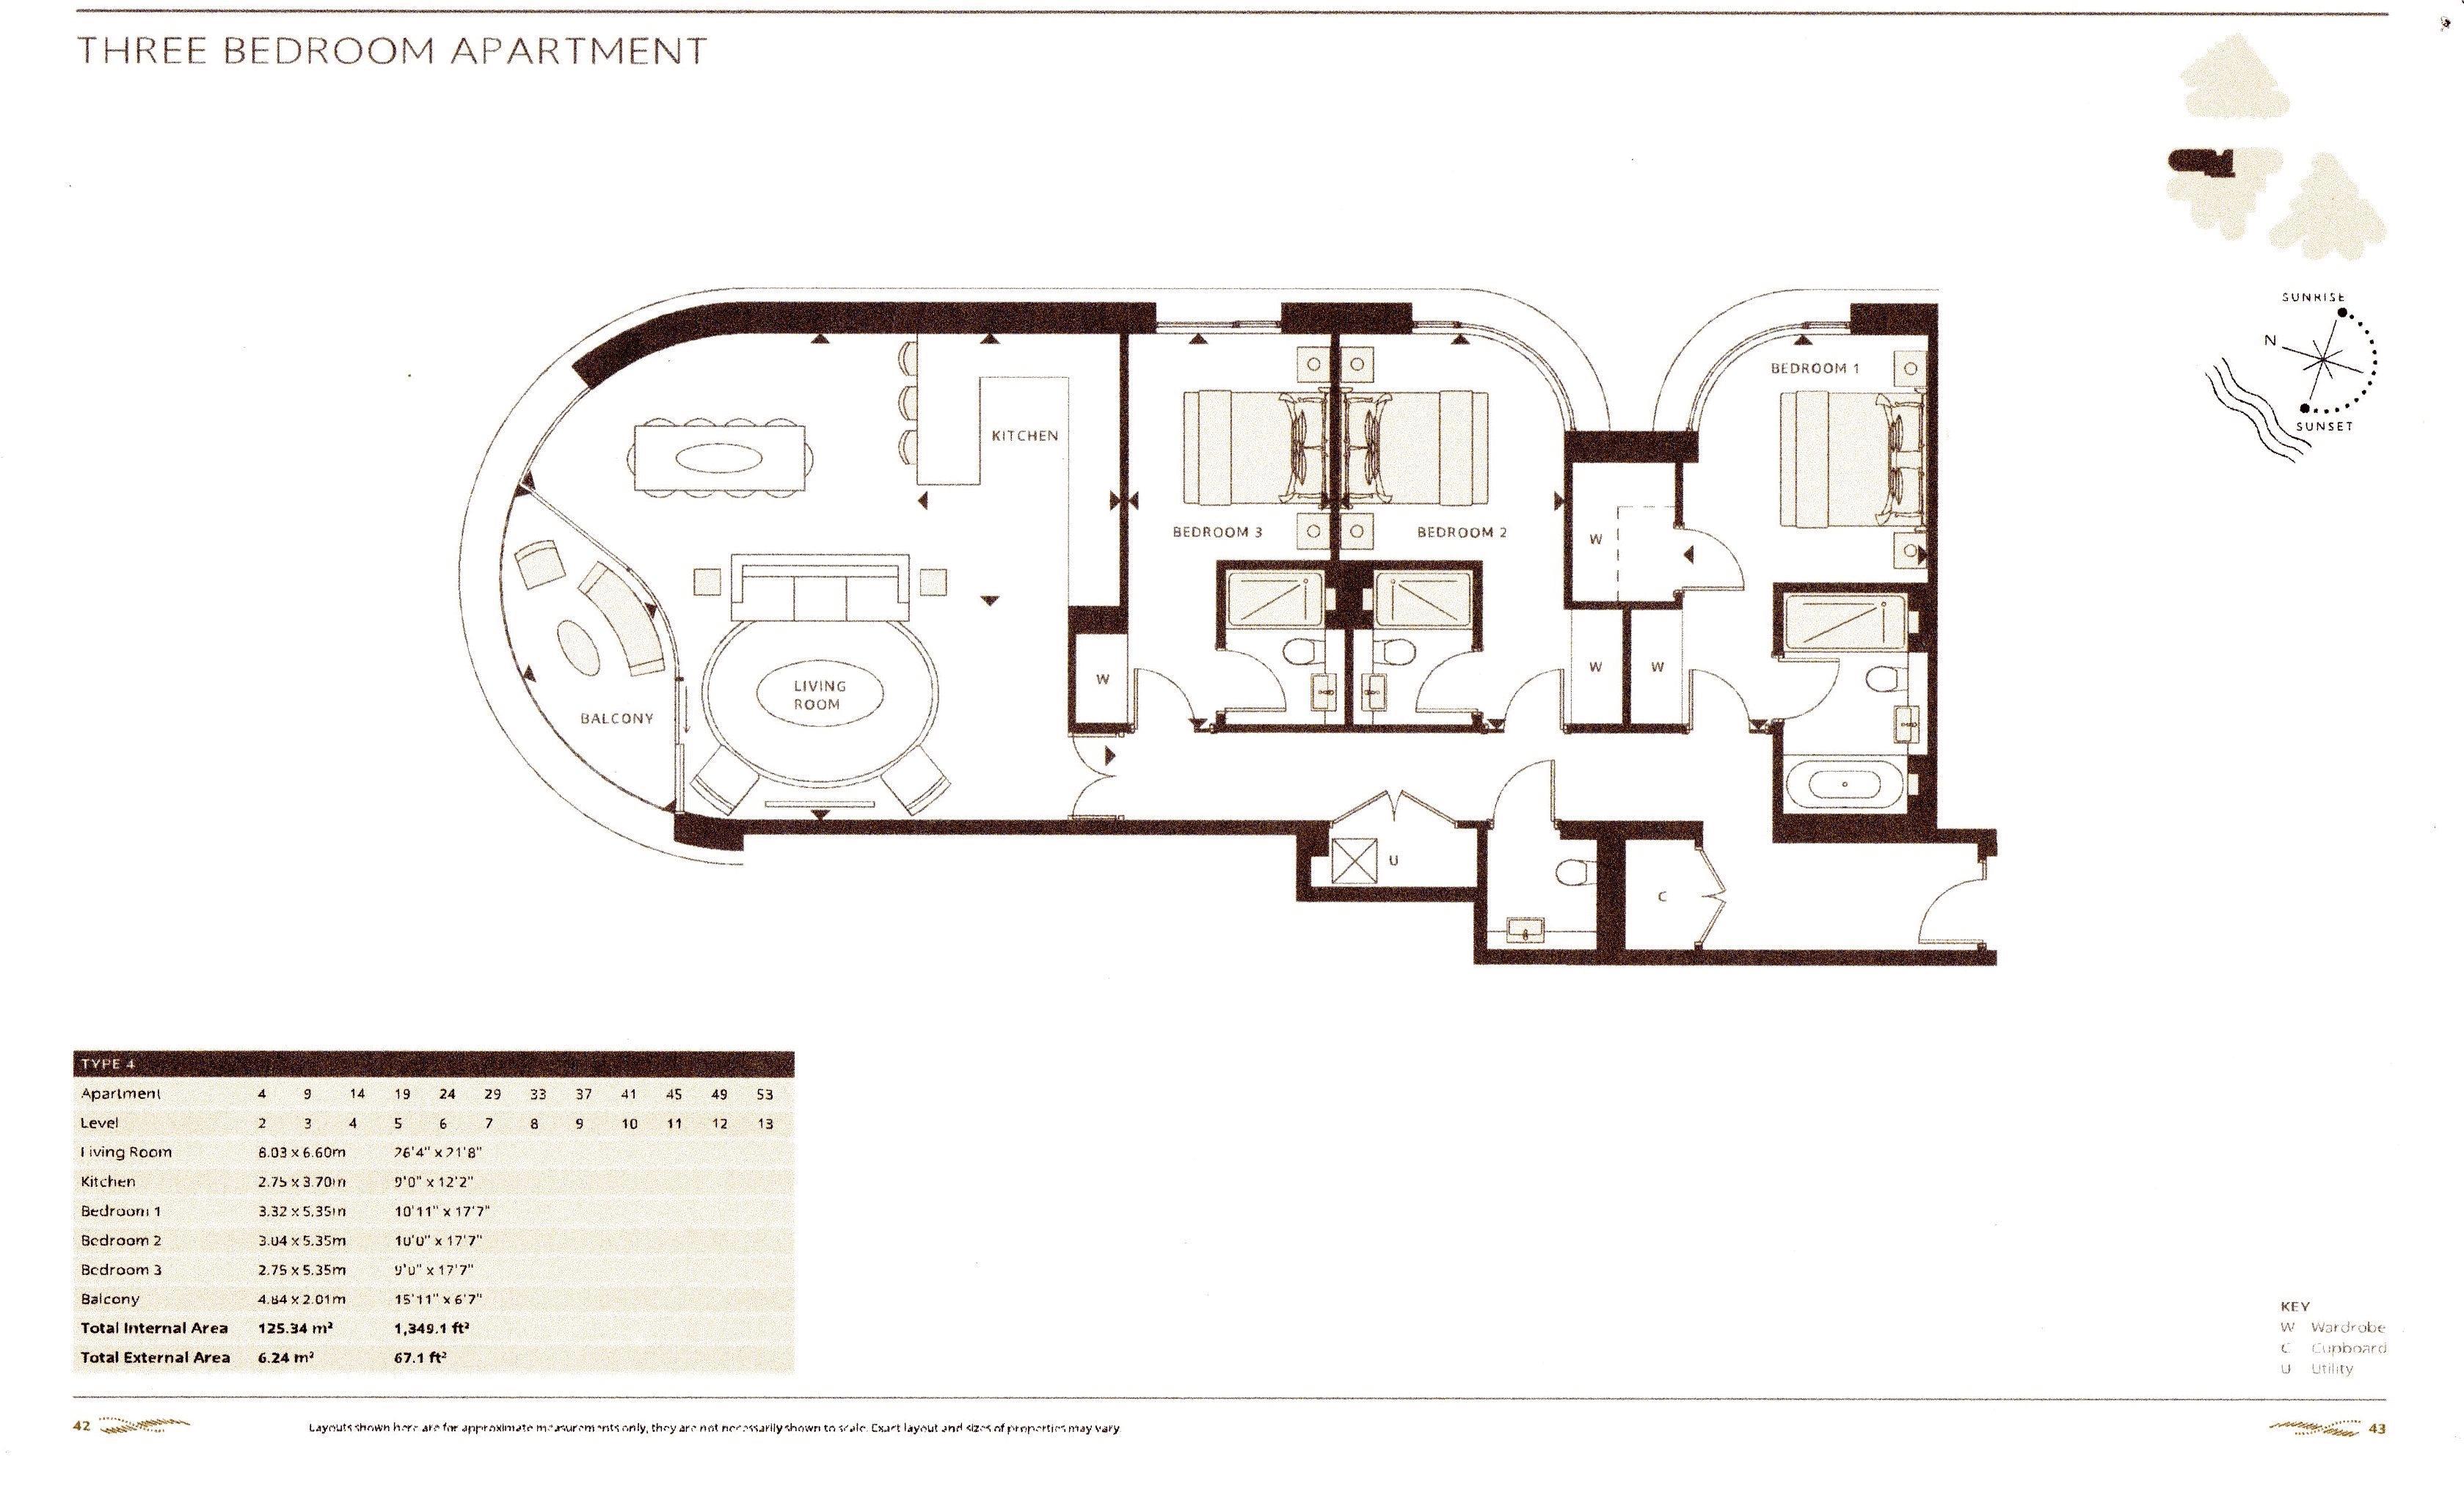 3 Bedroom Flat For Sale On Albert Embankment The Corniche